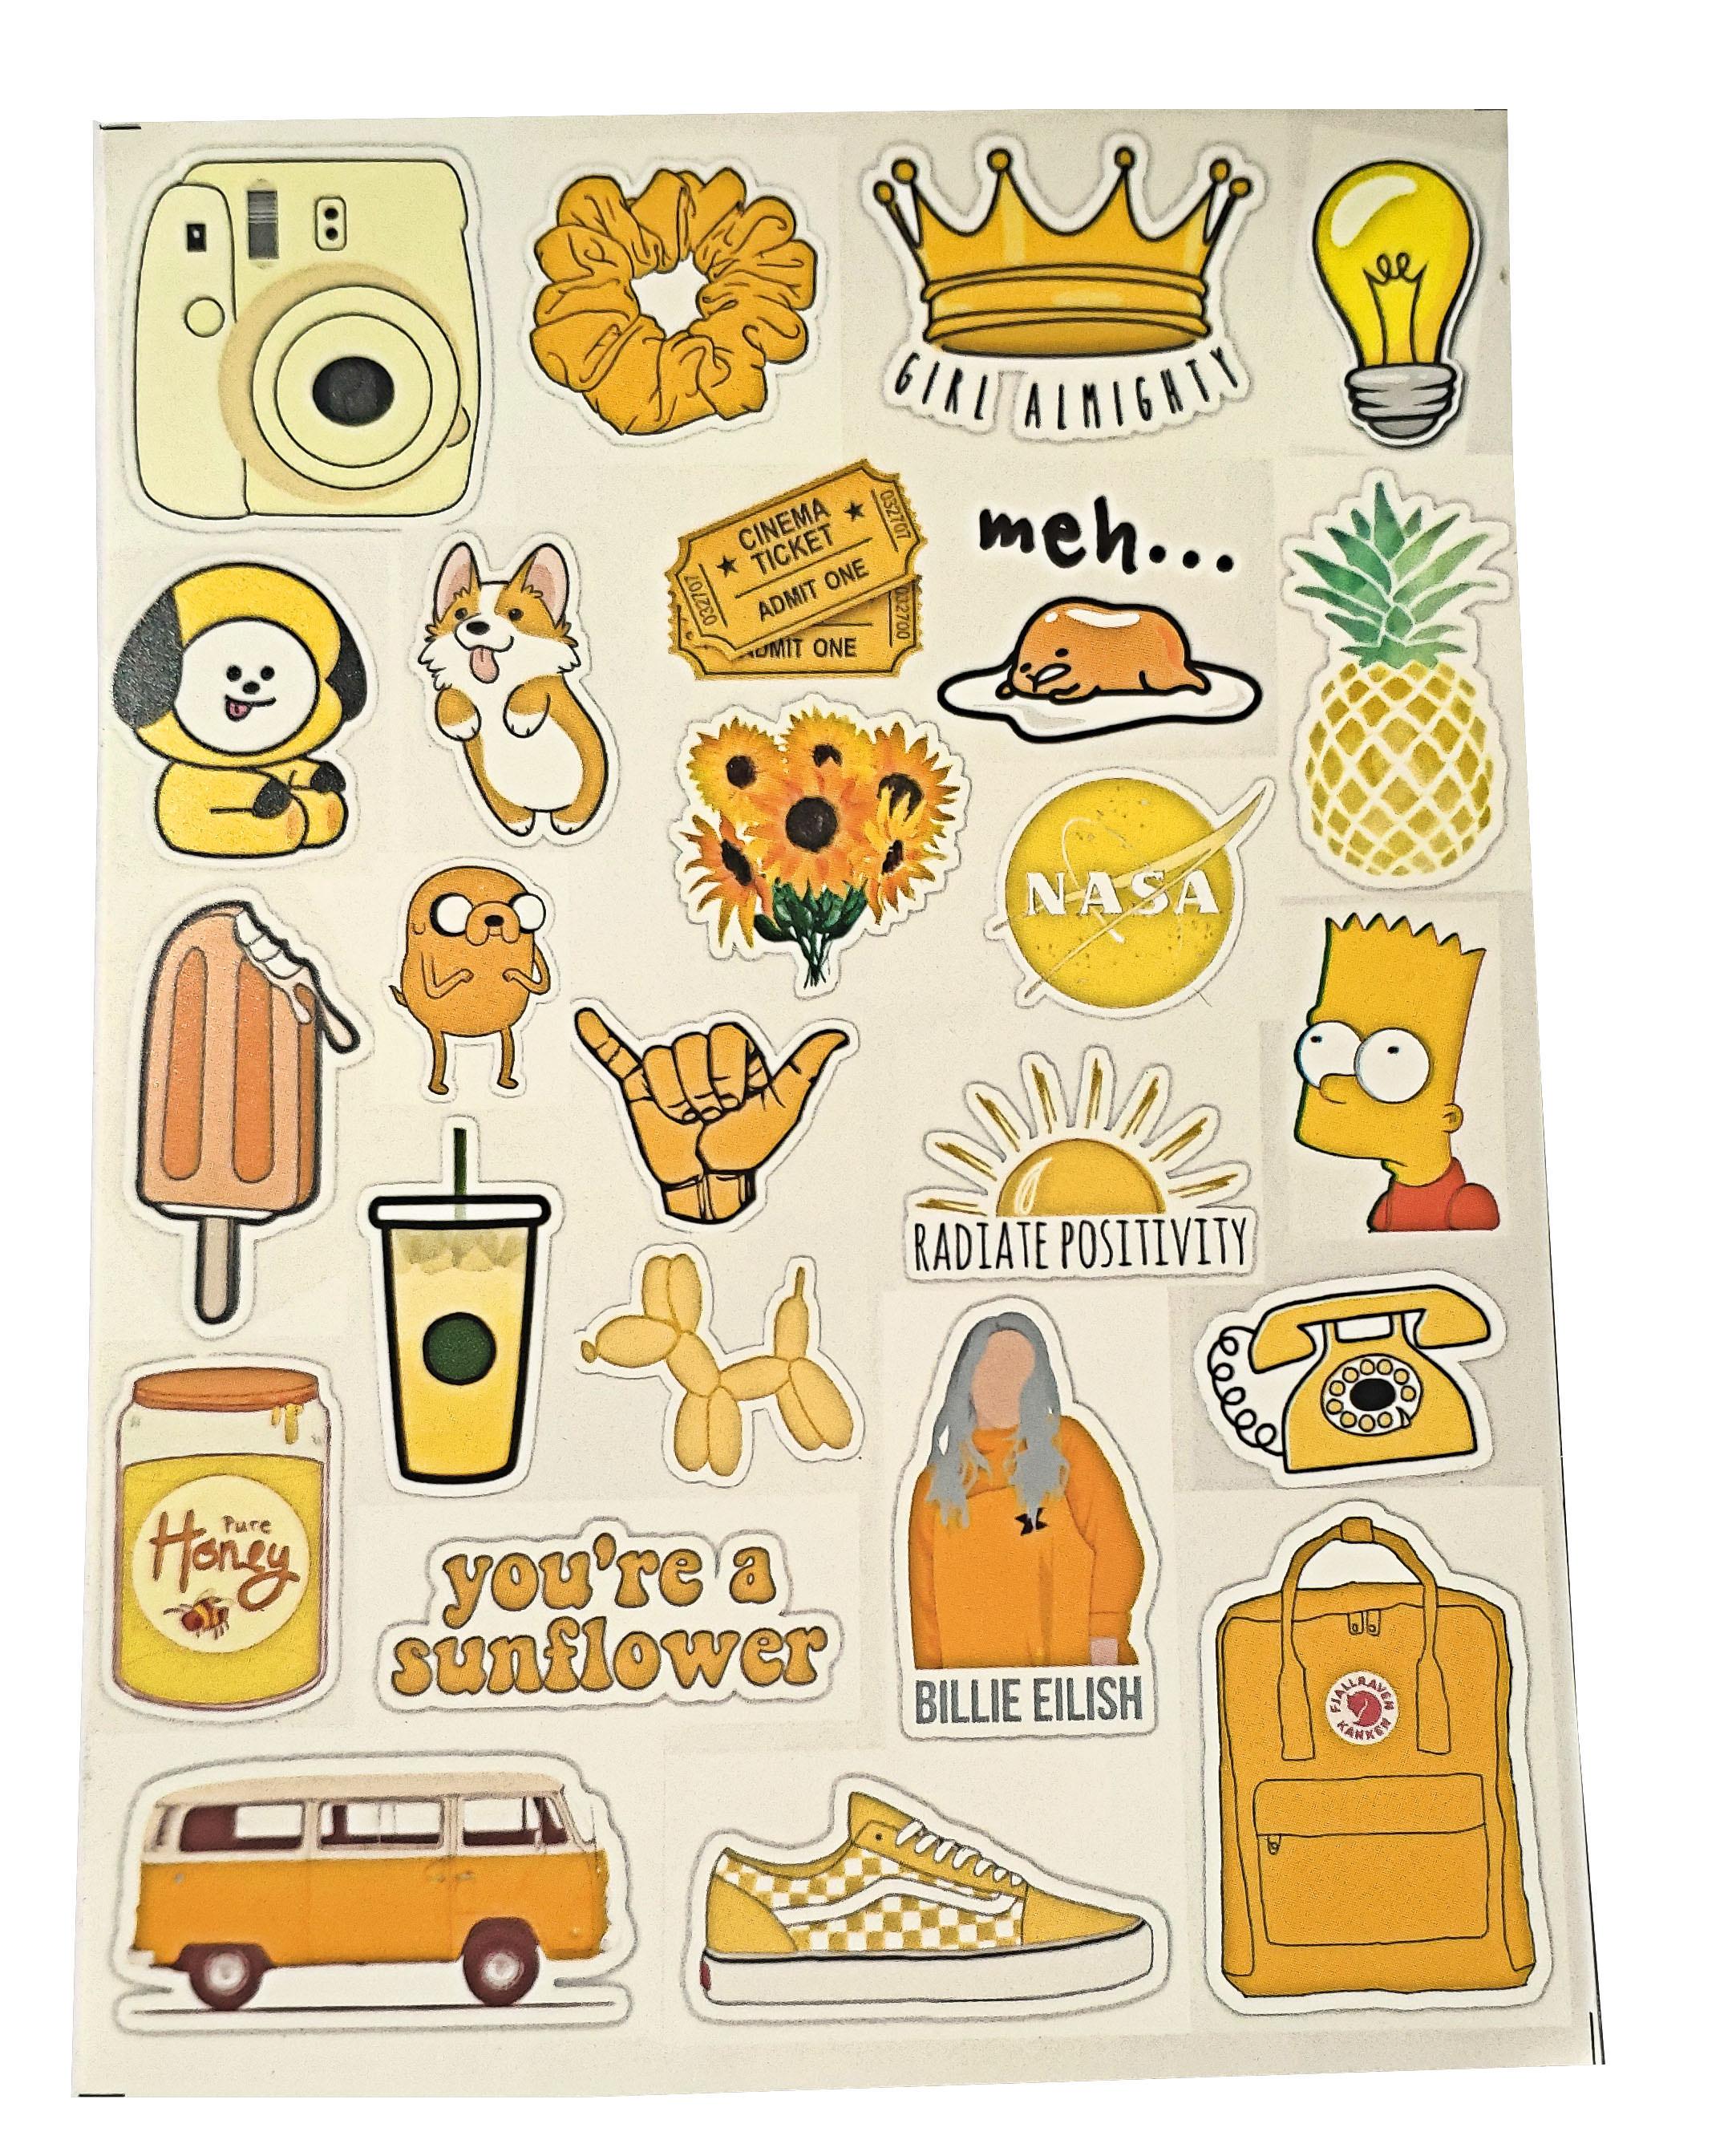 Stiker Aesthetic Tumblr Lucu Dan Cantik Uncutting Stiker Hp Keren Lazada Indonesia